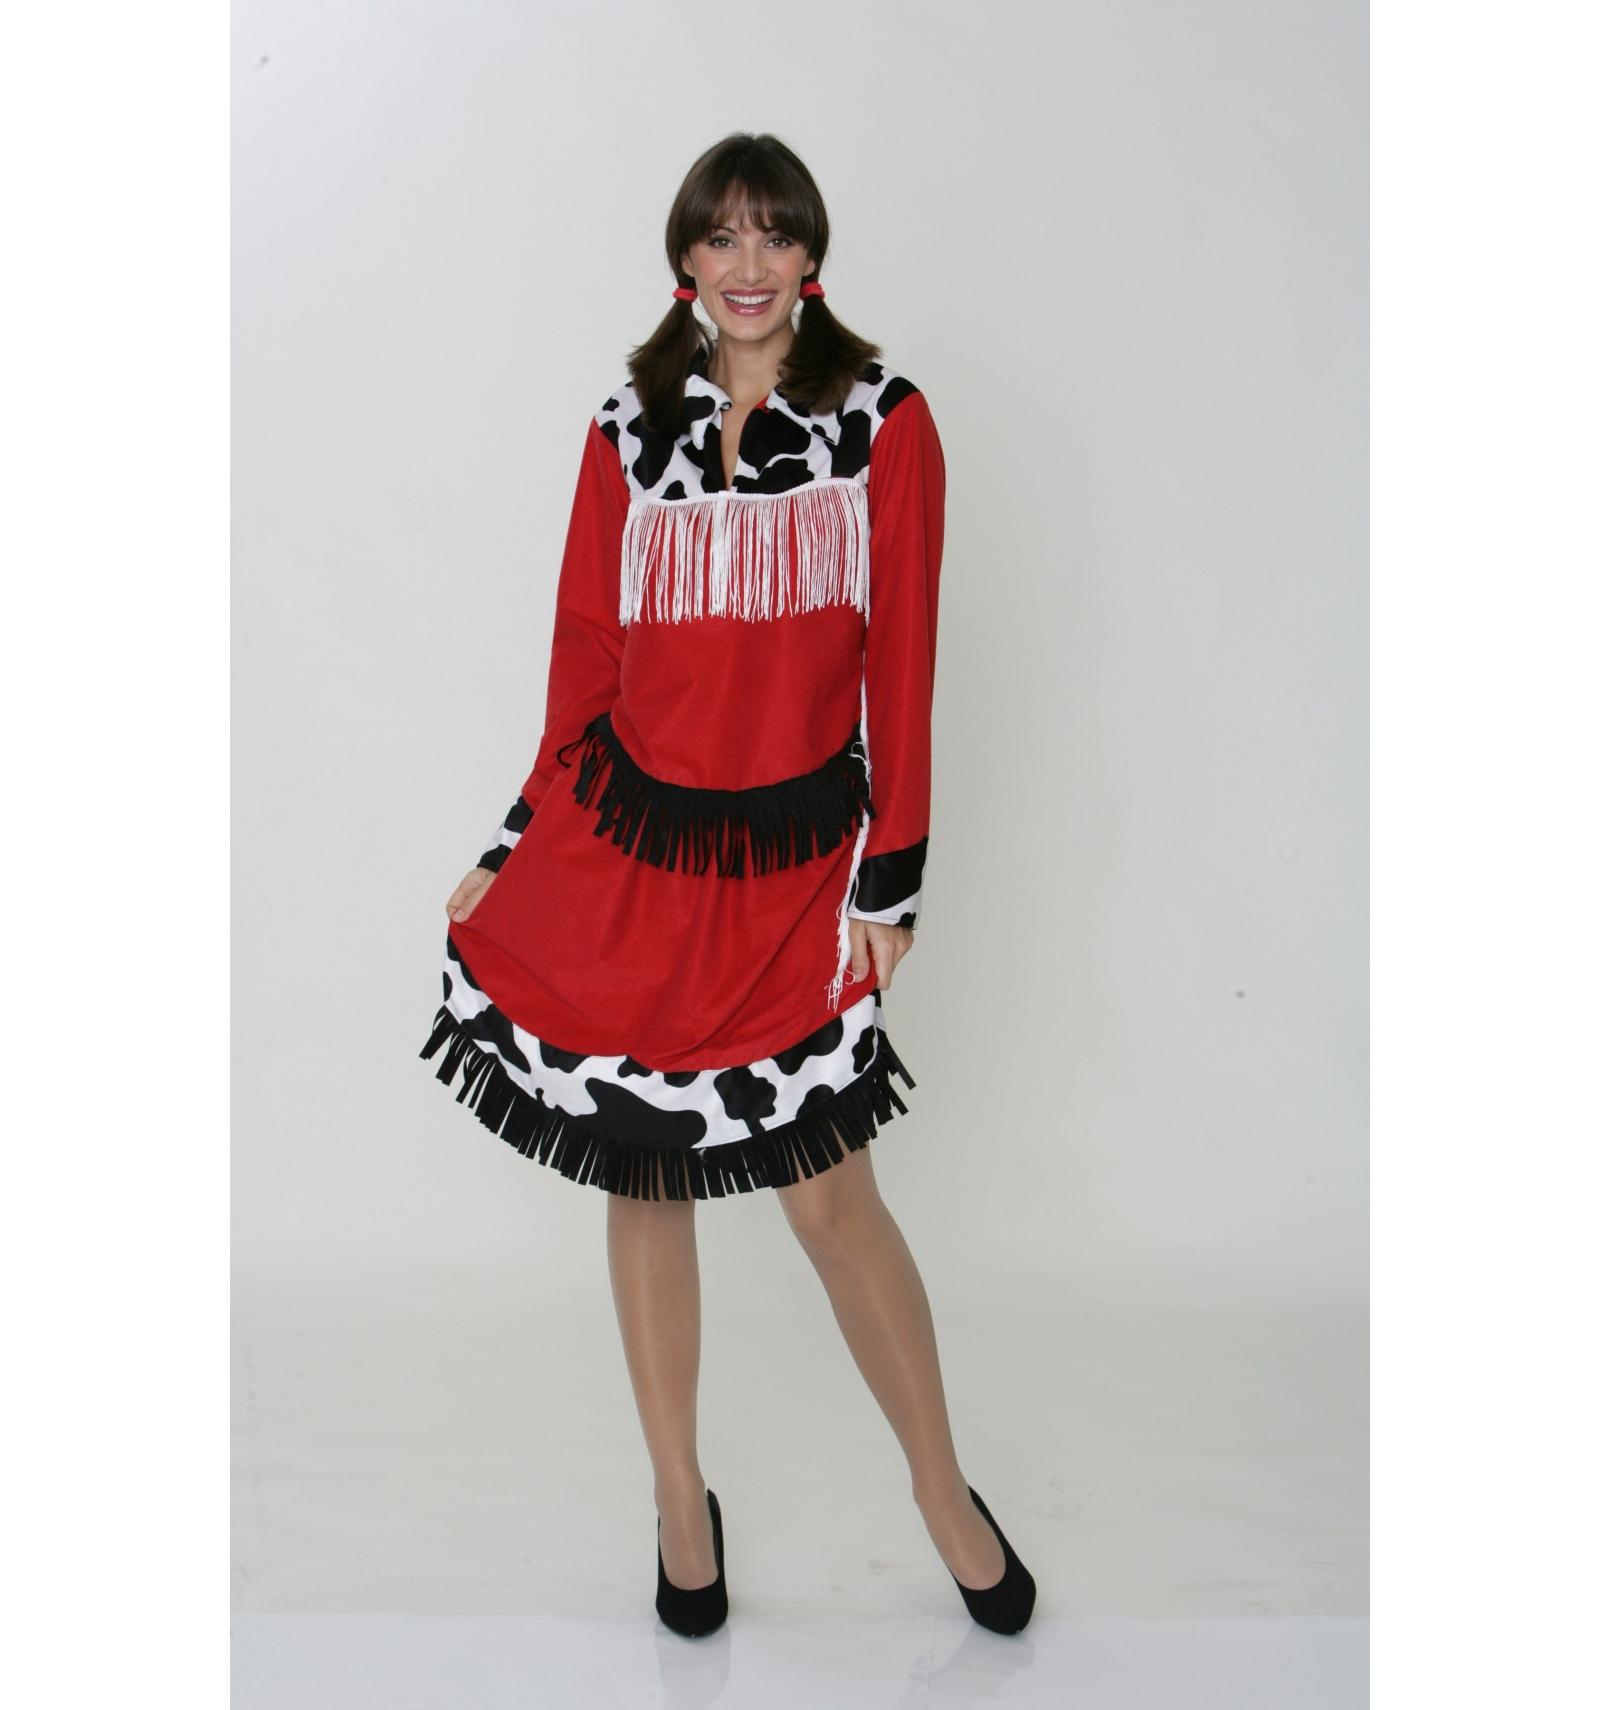 d guisement rod o far west femme adulte votre magasin de costumes en ligne. Black Bedroom Furniture Sets. Home Design Ideas